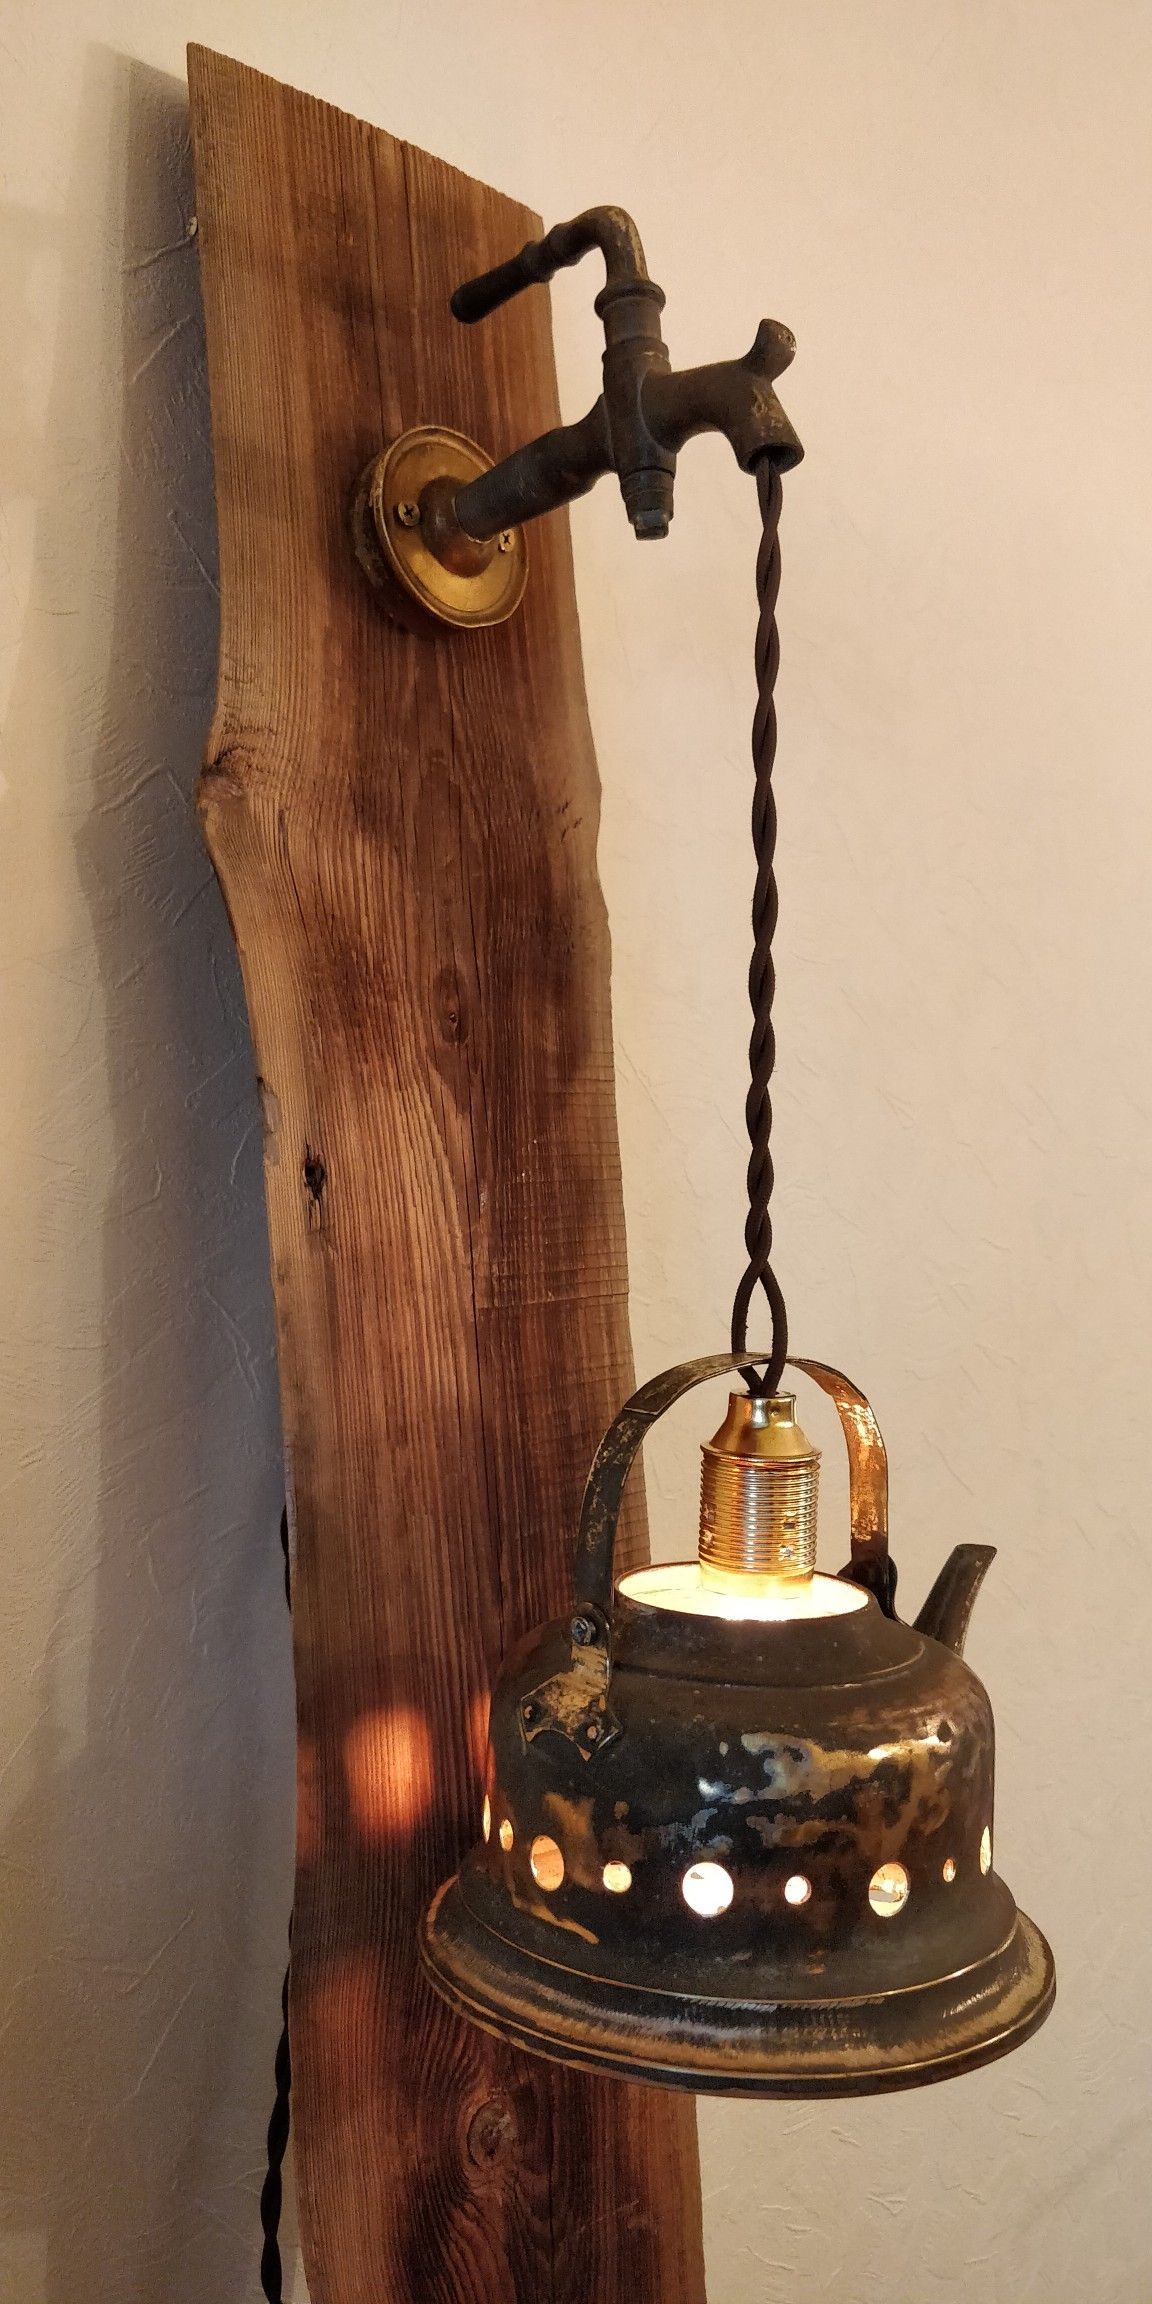 A lamp made of a teapot